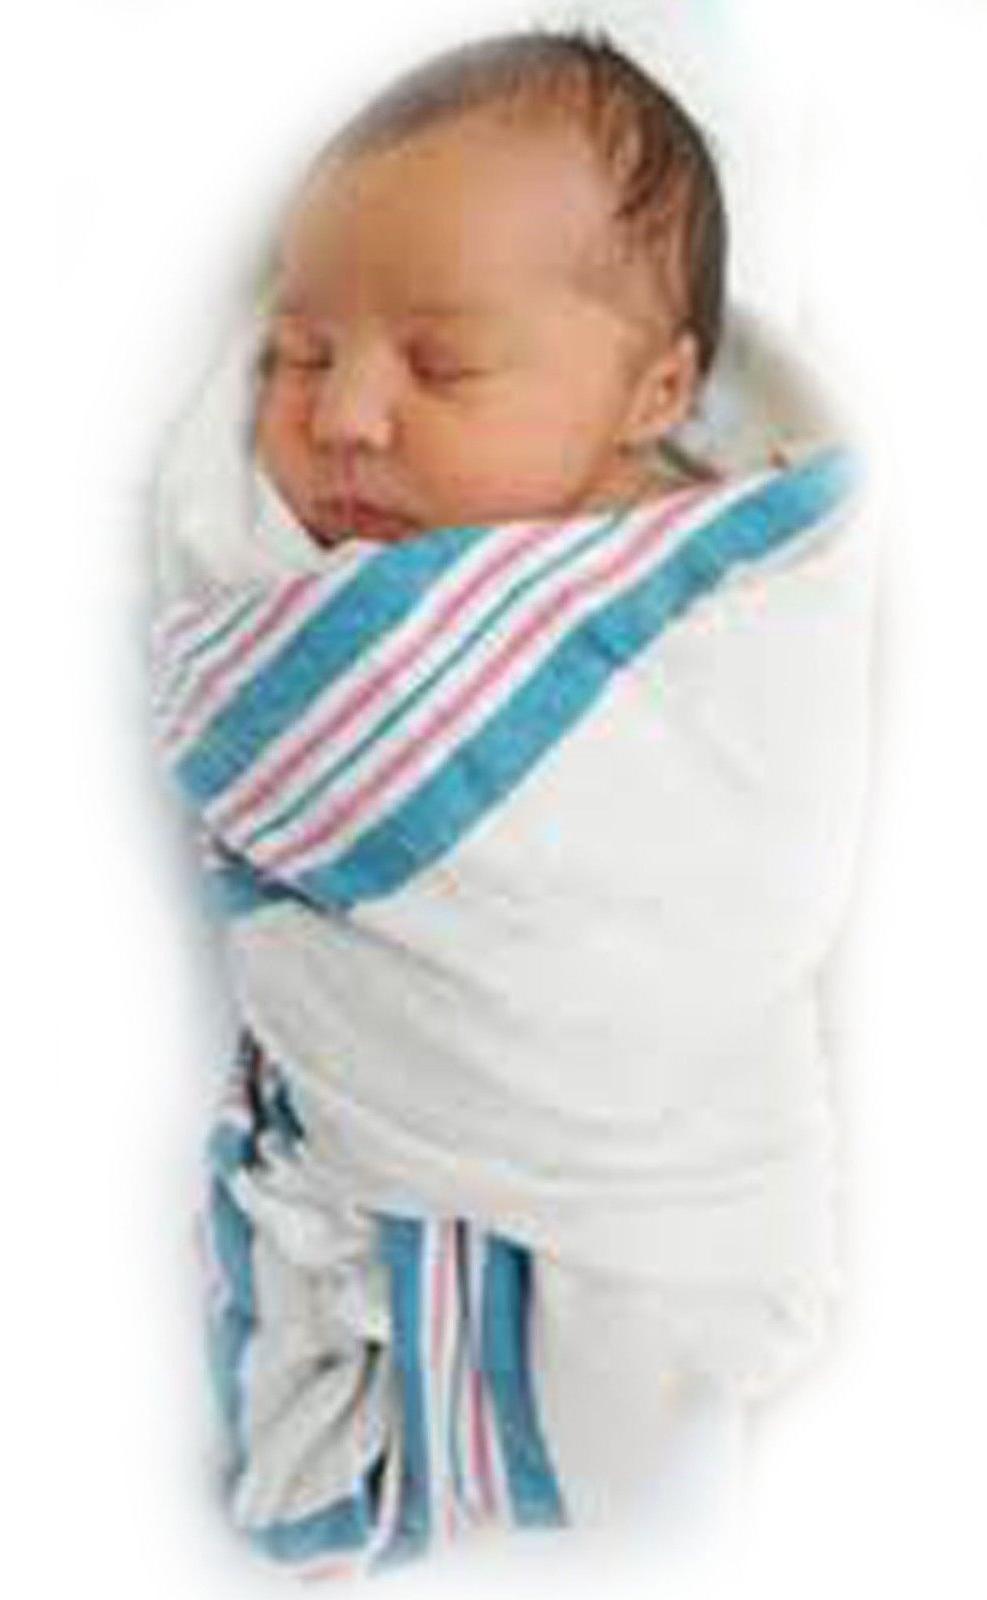 6- Baby-Infant Swaddling Hospital 30''x40'' Cotton